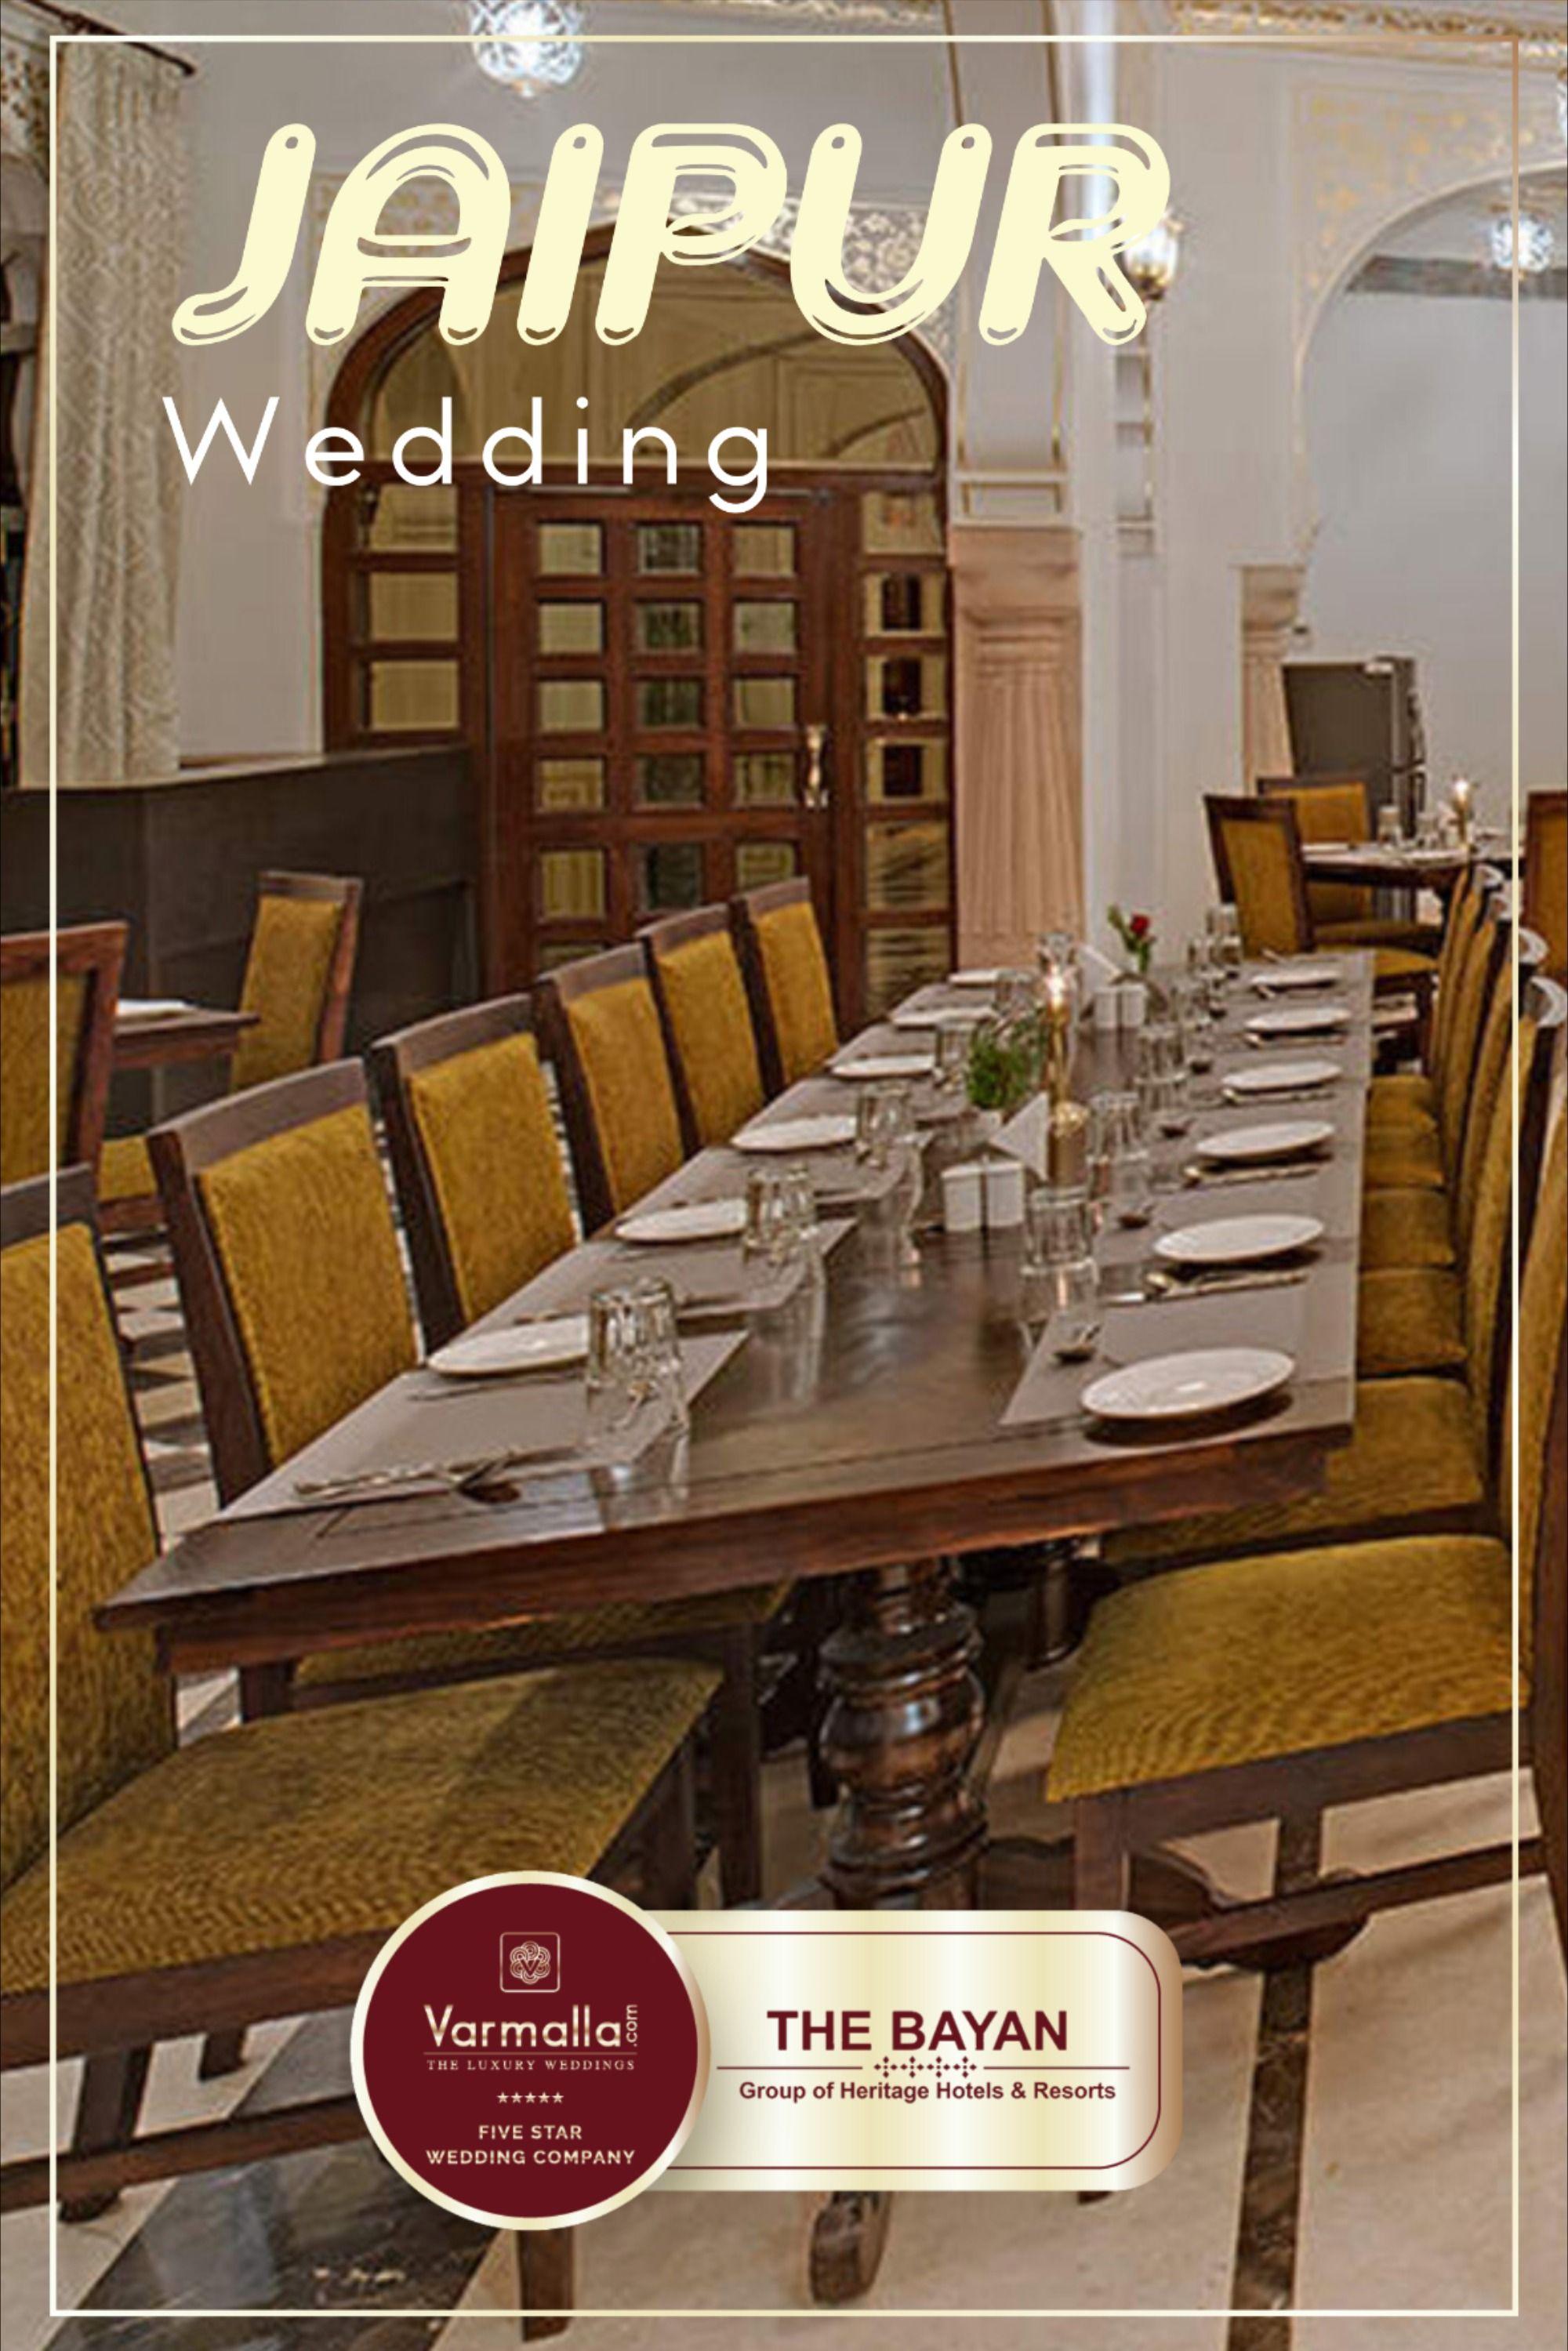 Jai Bagh Palace Jaipur Wedding Hotel In 2020 Luxury Destination Wedding Hotel Wedding Wedding Company